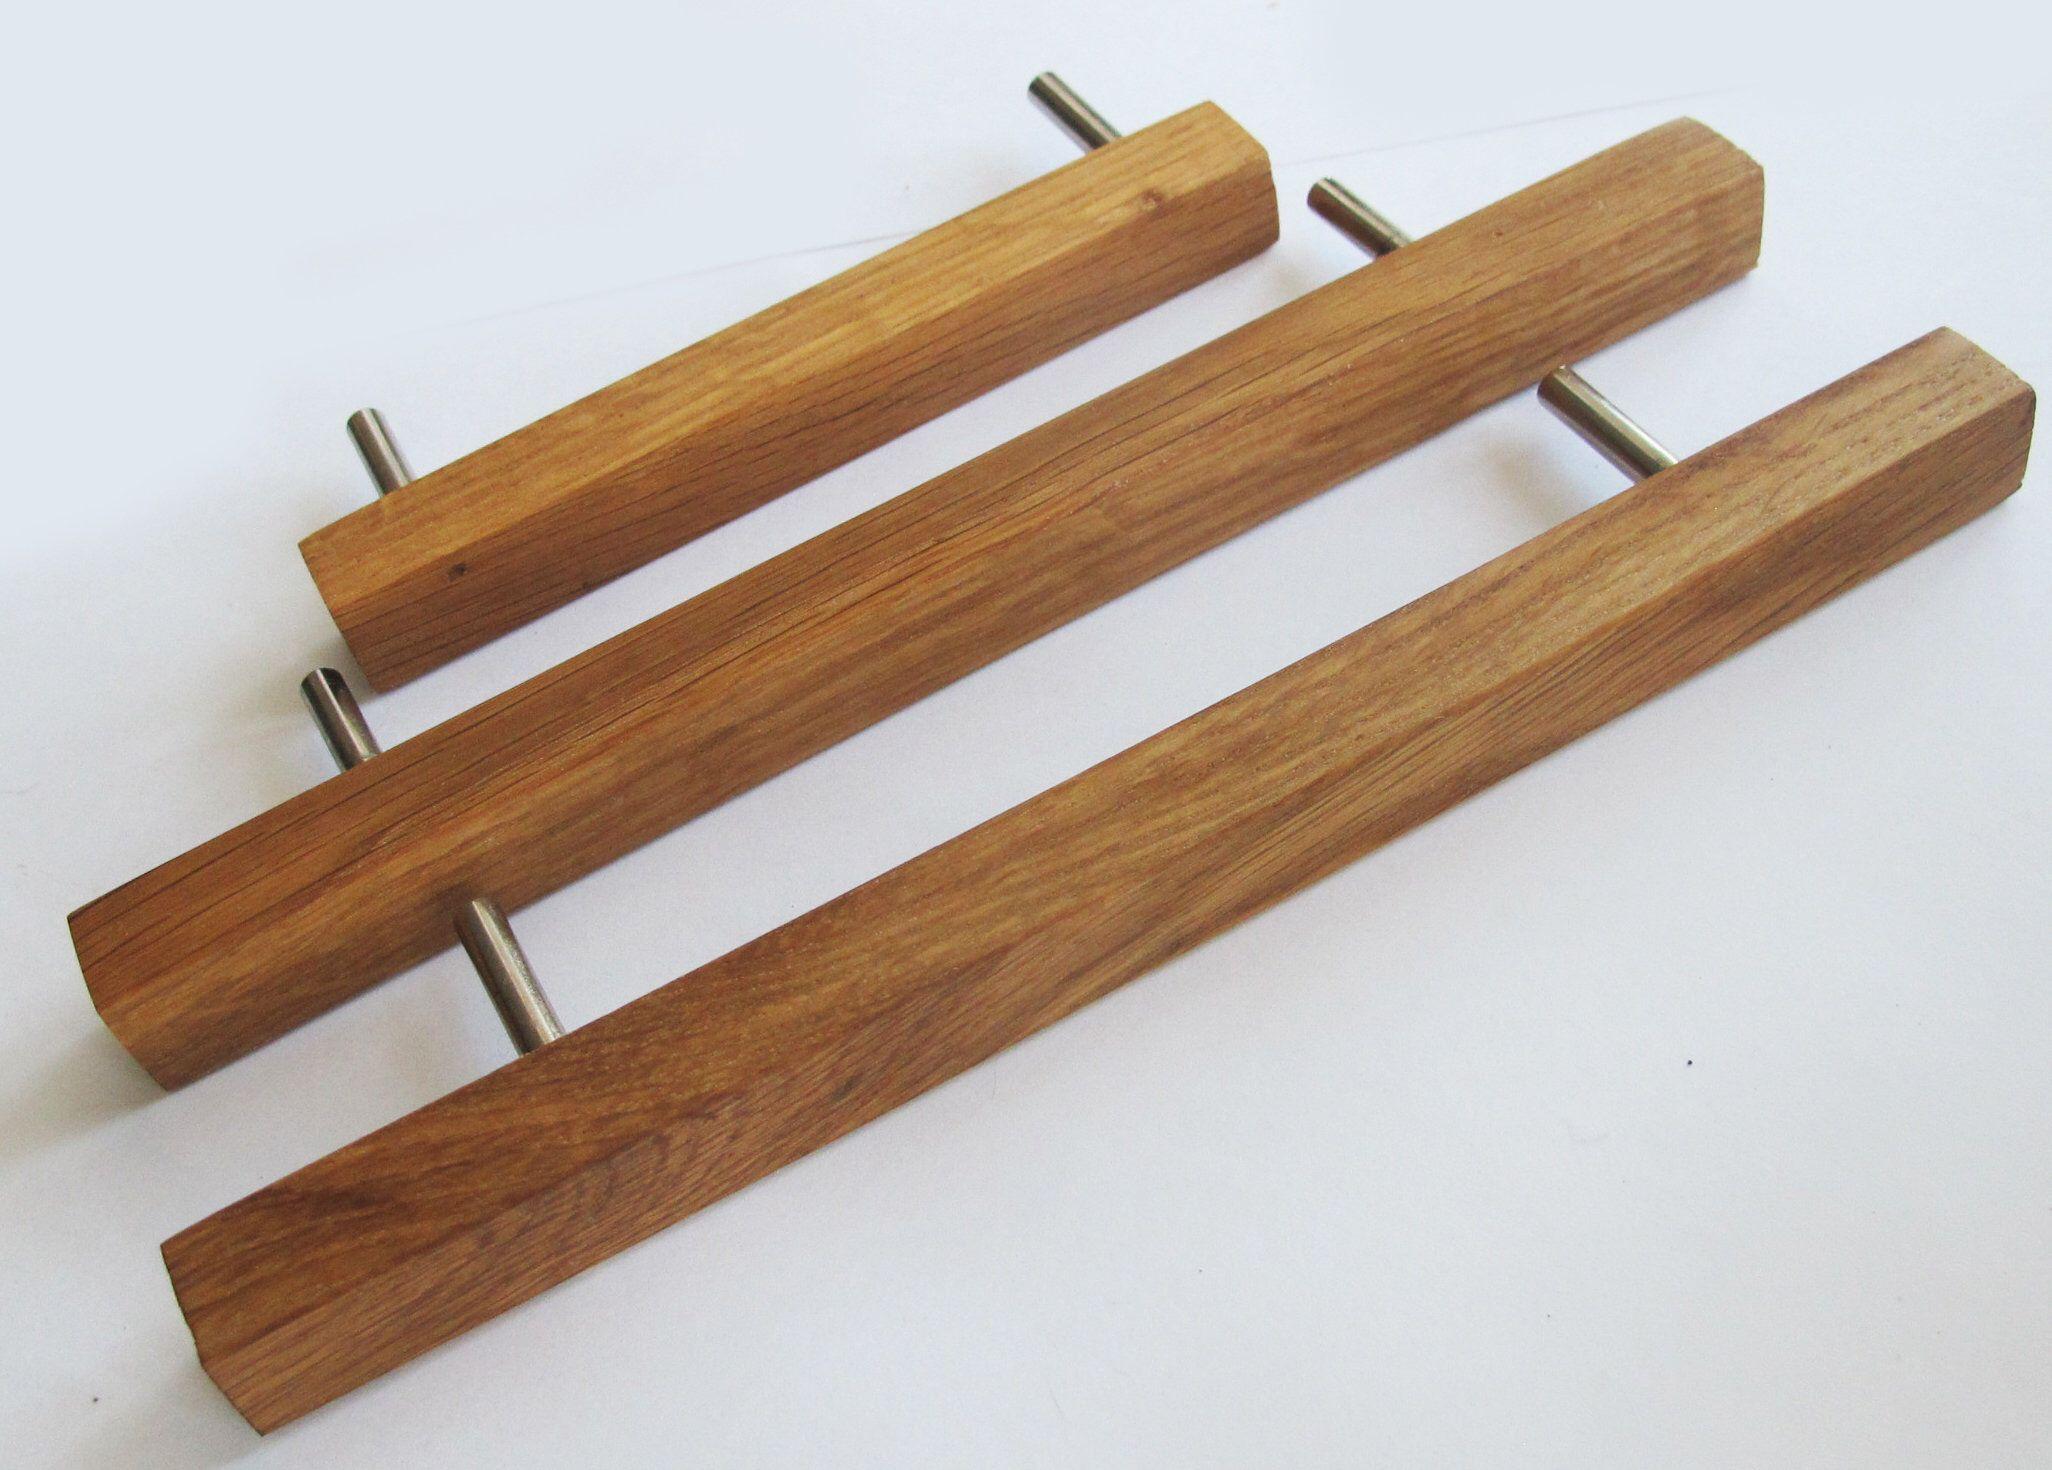 Oak Wood Drawer Pulls Set Of 2 Wooden Drawer Handles Modern